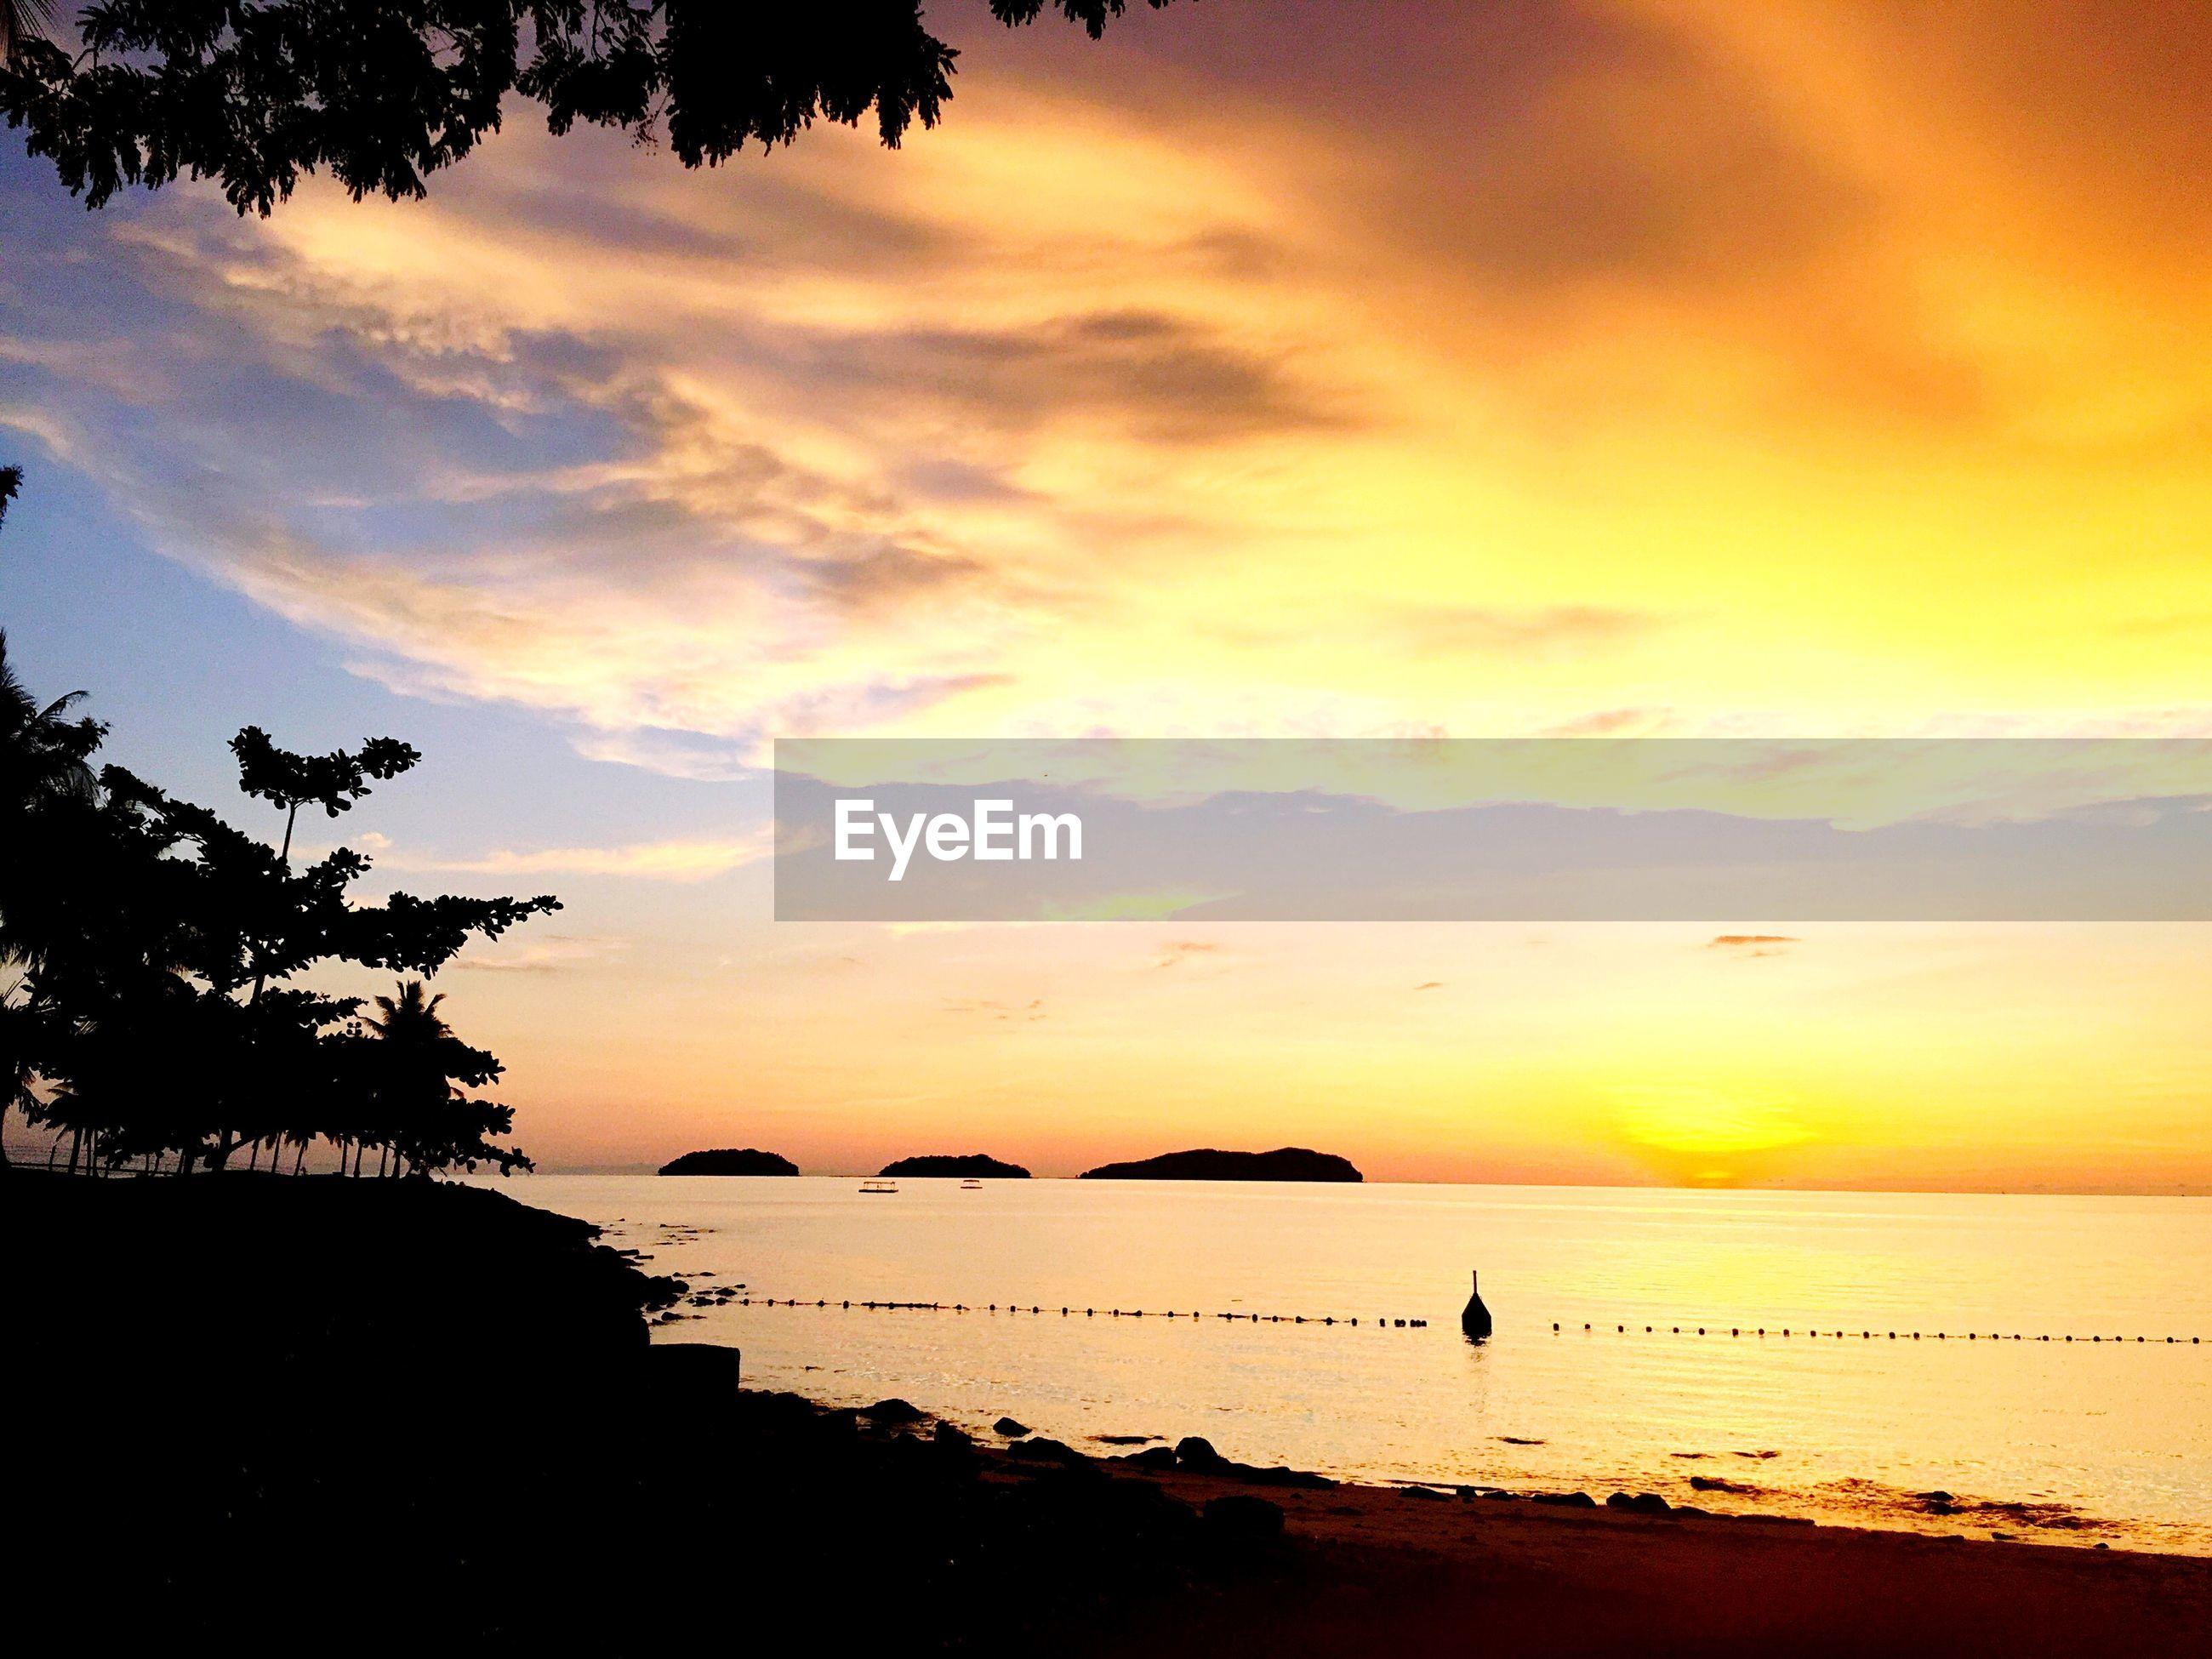 Moody sunset over calm sea